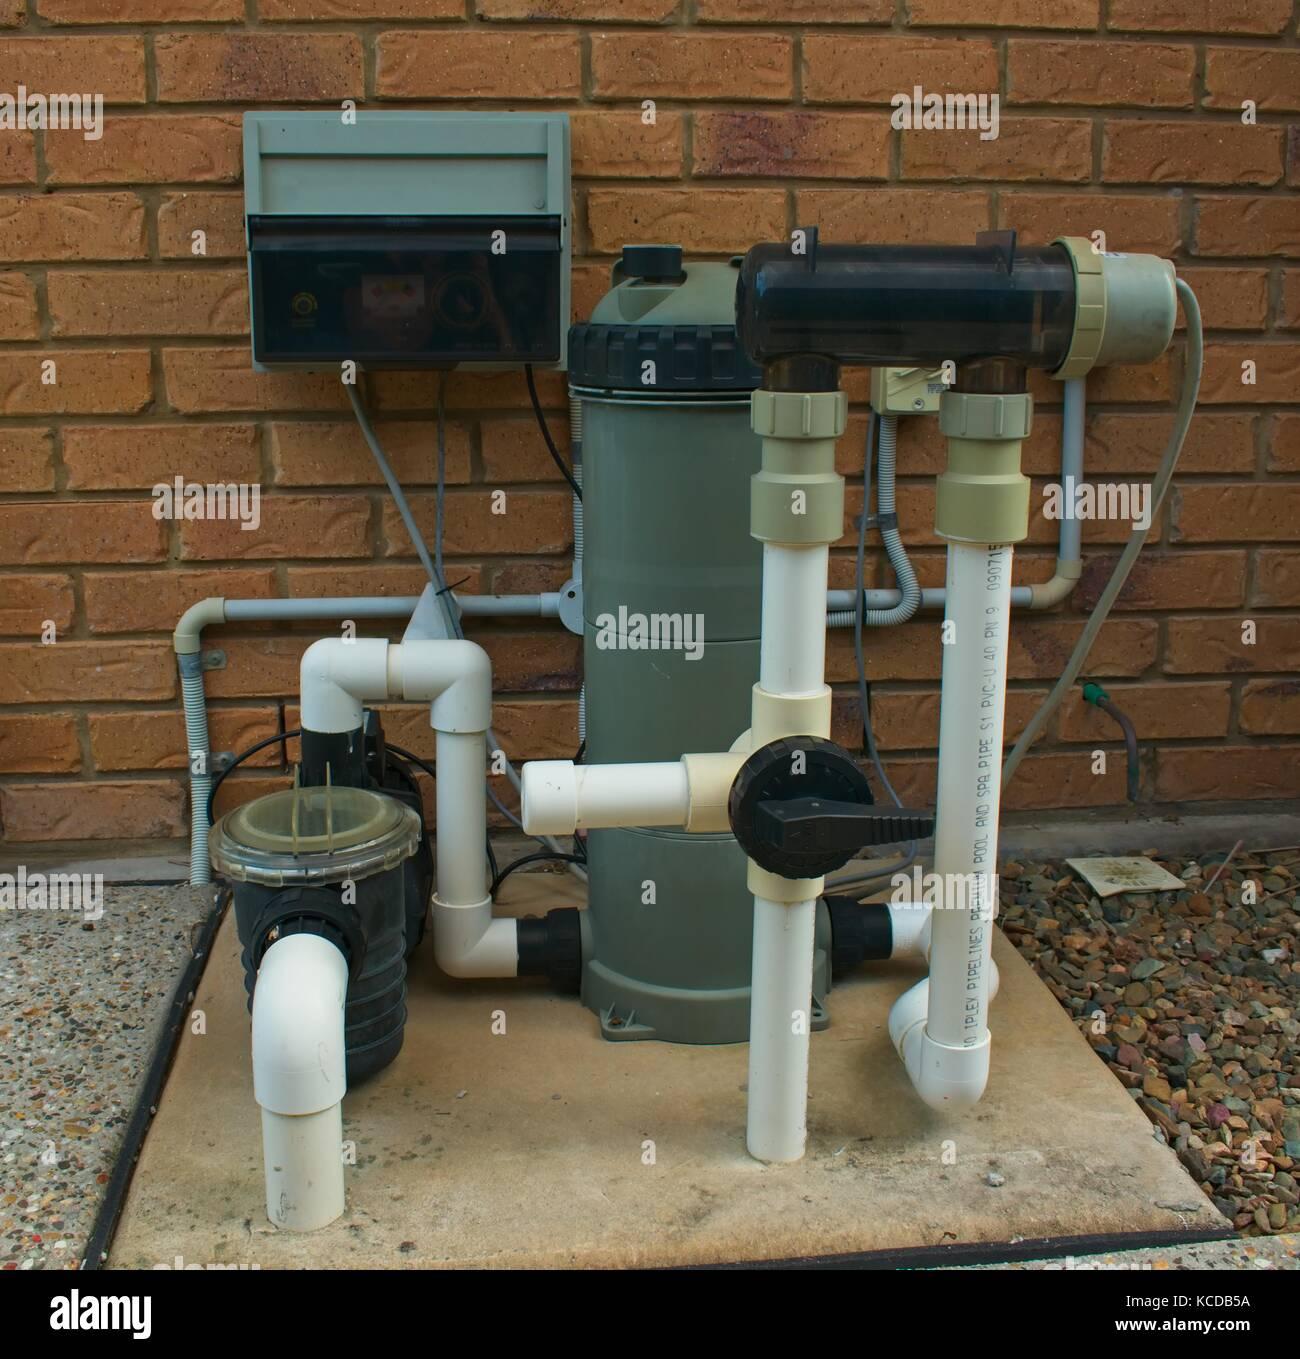 pump filter and clorinator setup for swimming pool stock photo 162563334 alamy. Black Bedroom Furniture Sets. Home Design Ideas